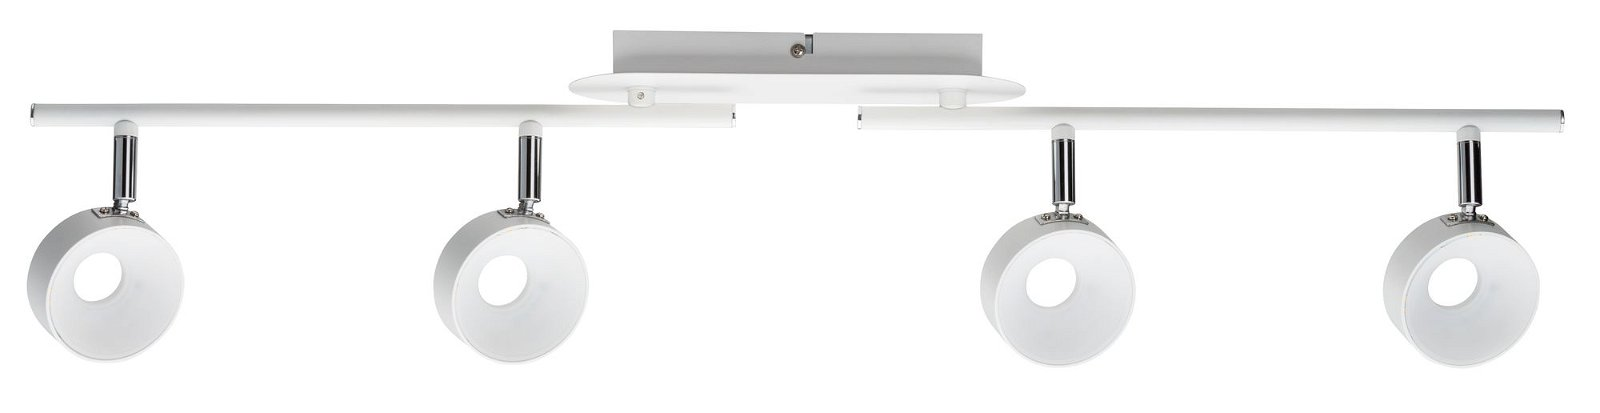 Deckenstrahler Funnel 3000K 4x540lm 230V 4x6W Weiß matt/Chrom